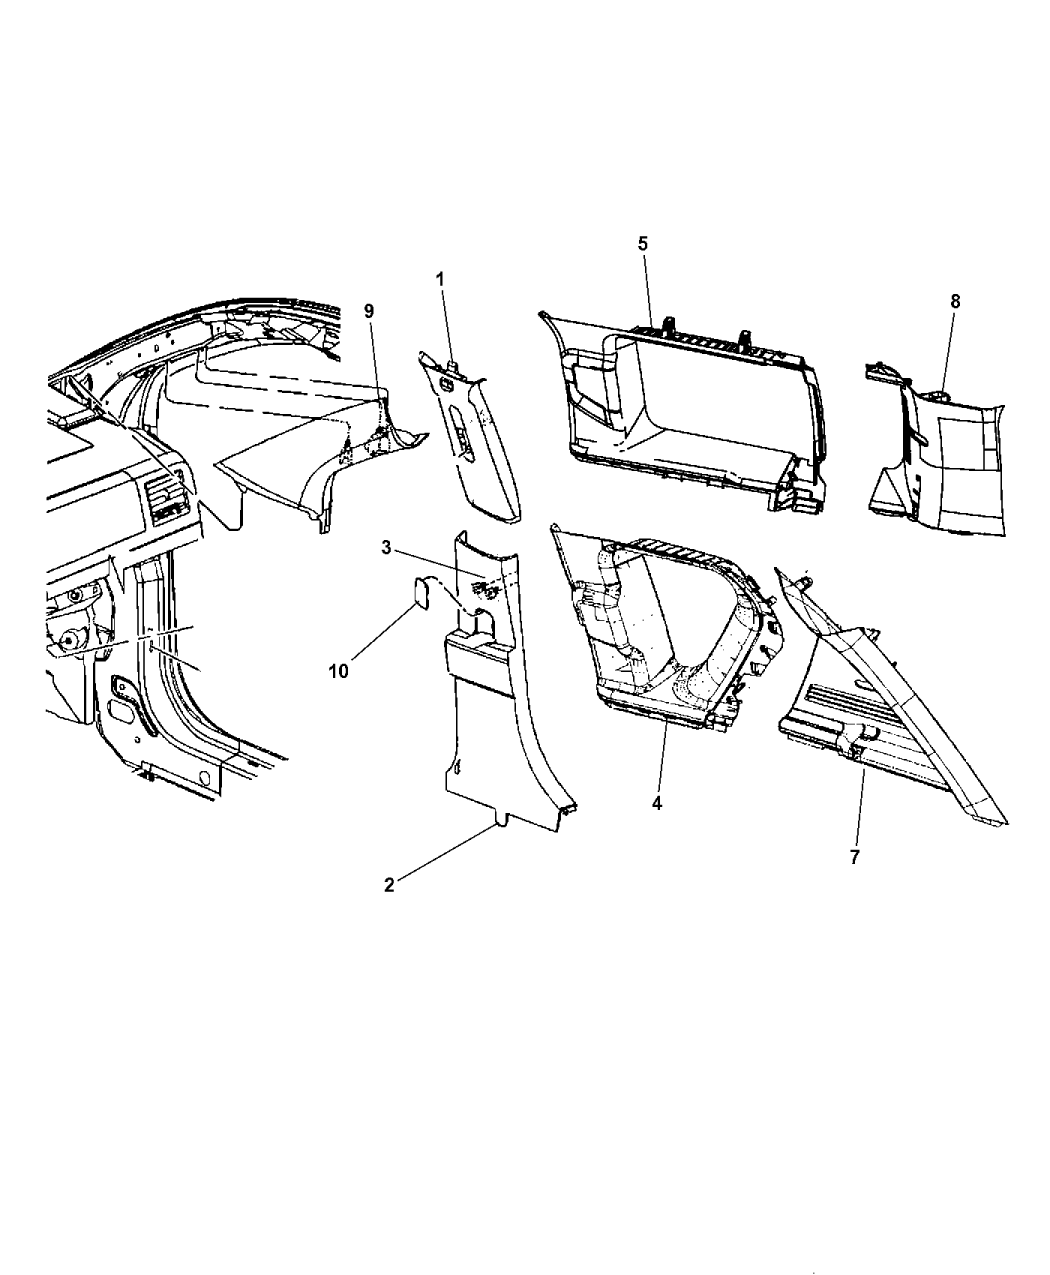 2014 jeep patriot interior moldings and pillars